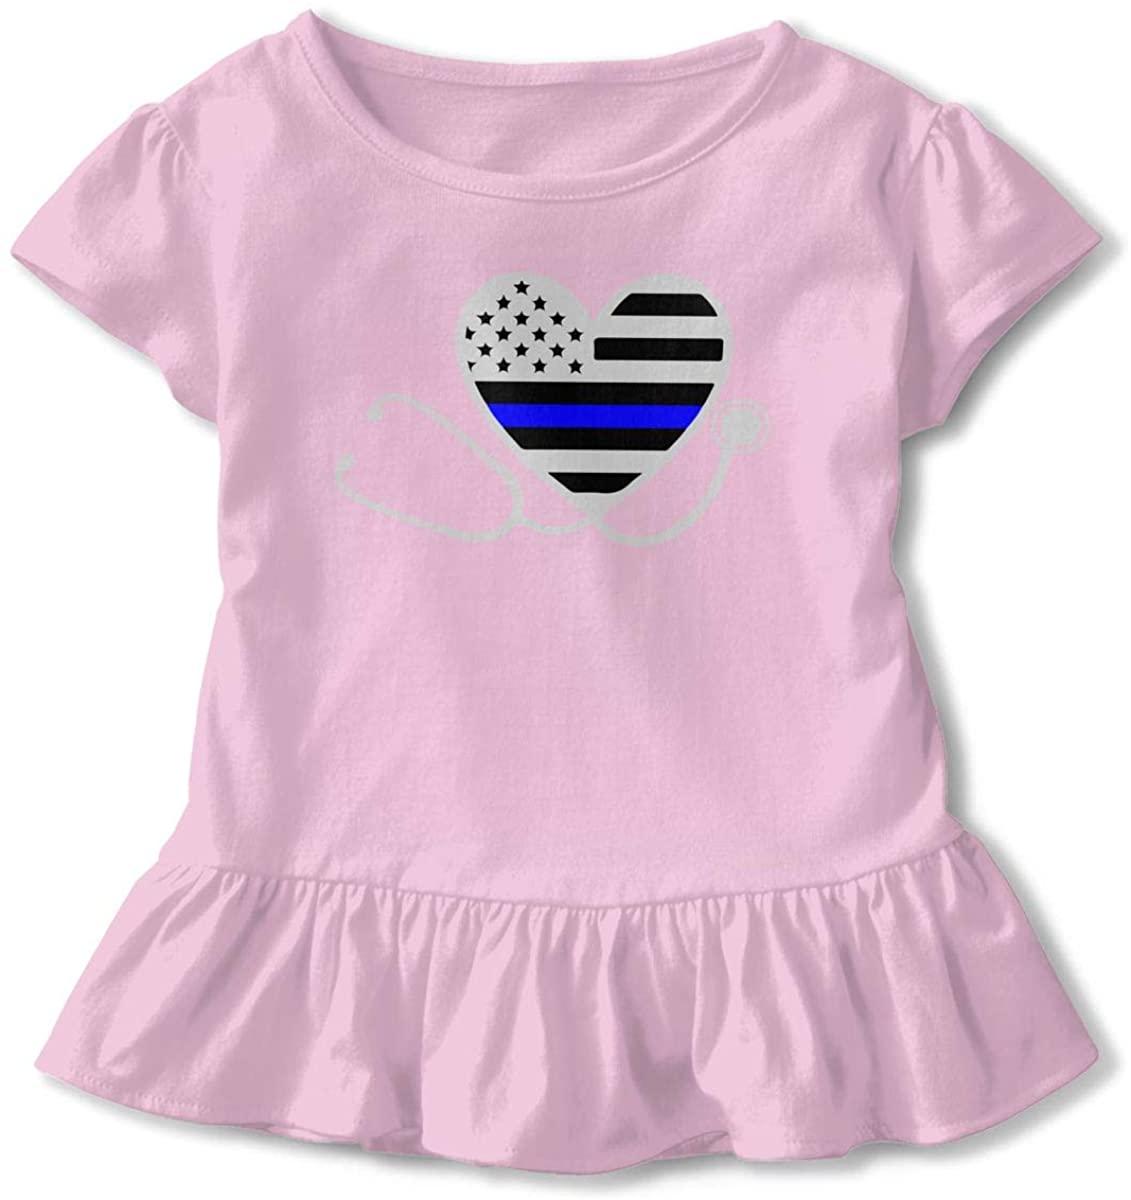 EASON-G Toddler Girl's Ruffle T-Shirt Nurses Police Wife Thin Blue Line Flag Short Sleeve 2-6T